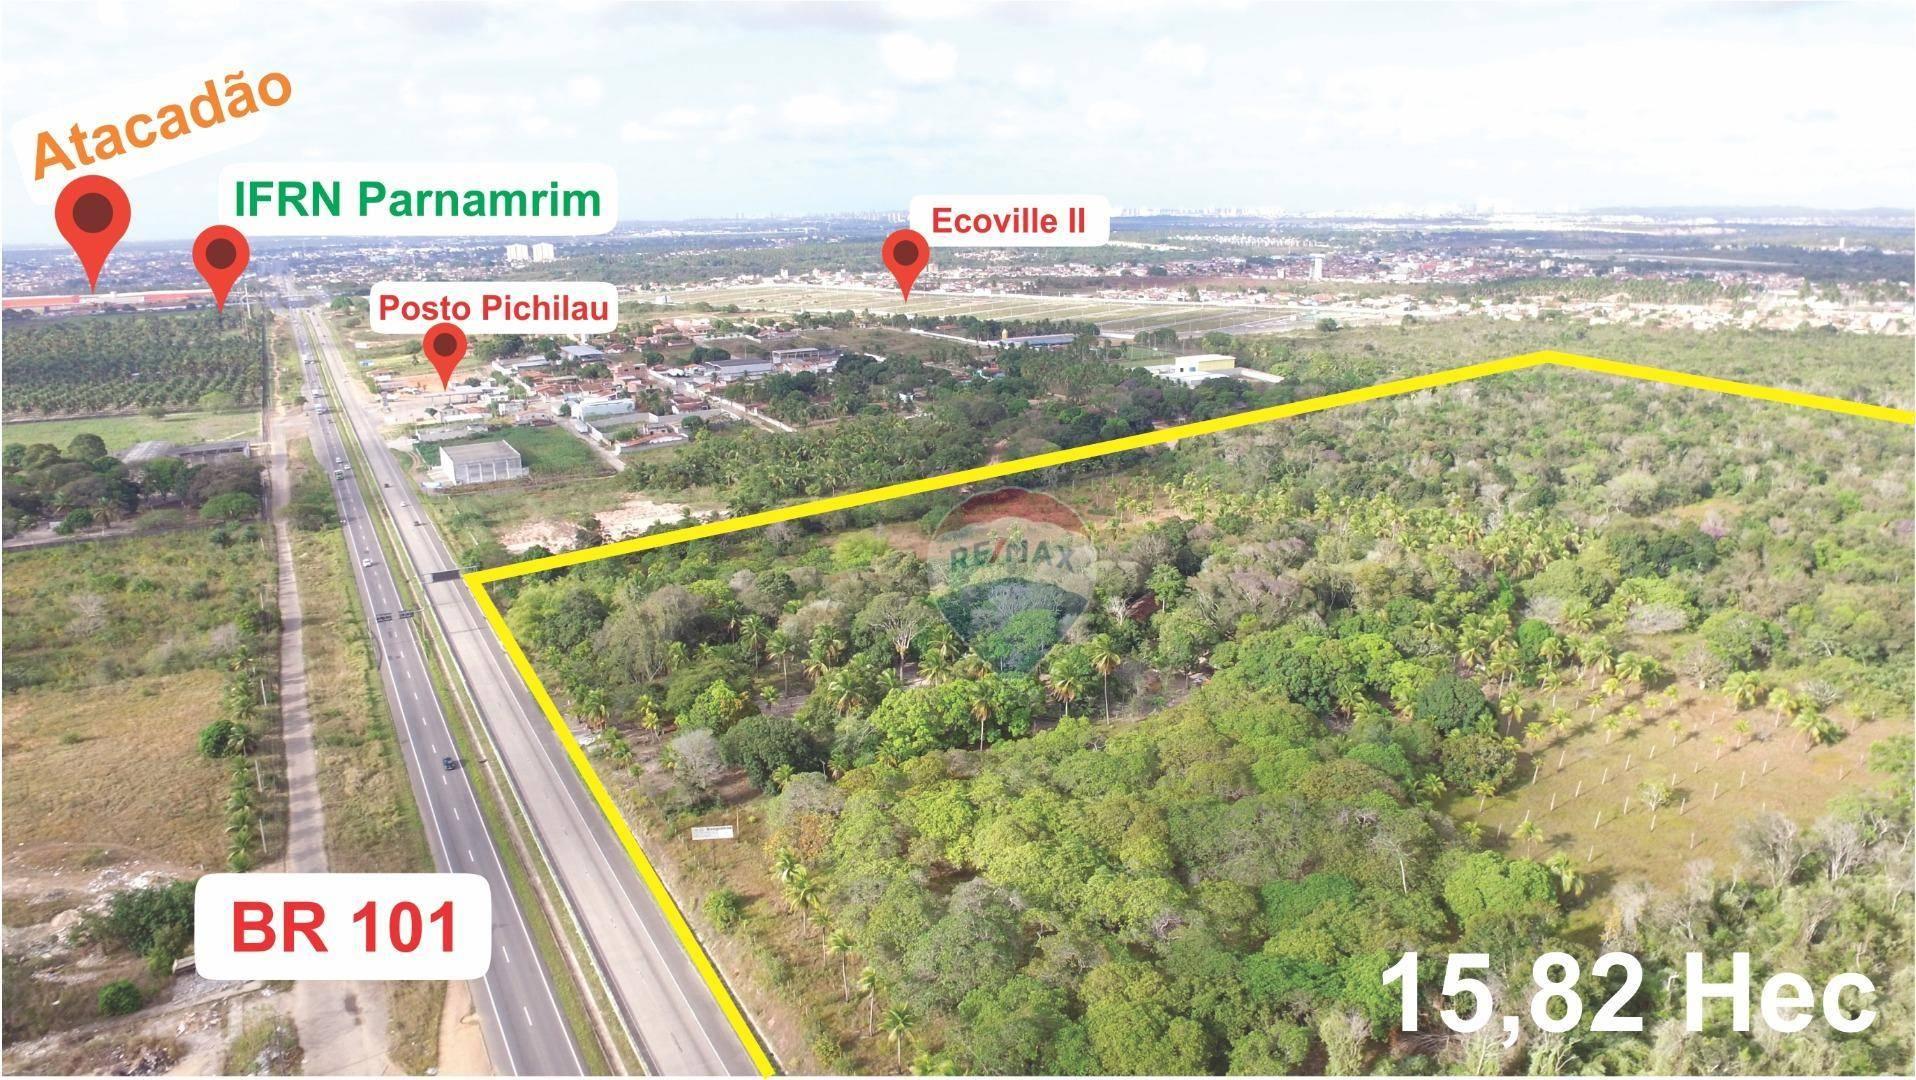 Área à venda na BR 101, 15,82 Ha por R$ 63,00 m² - Cajupiranga - Parnamirim/RN